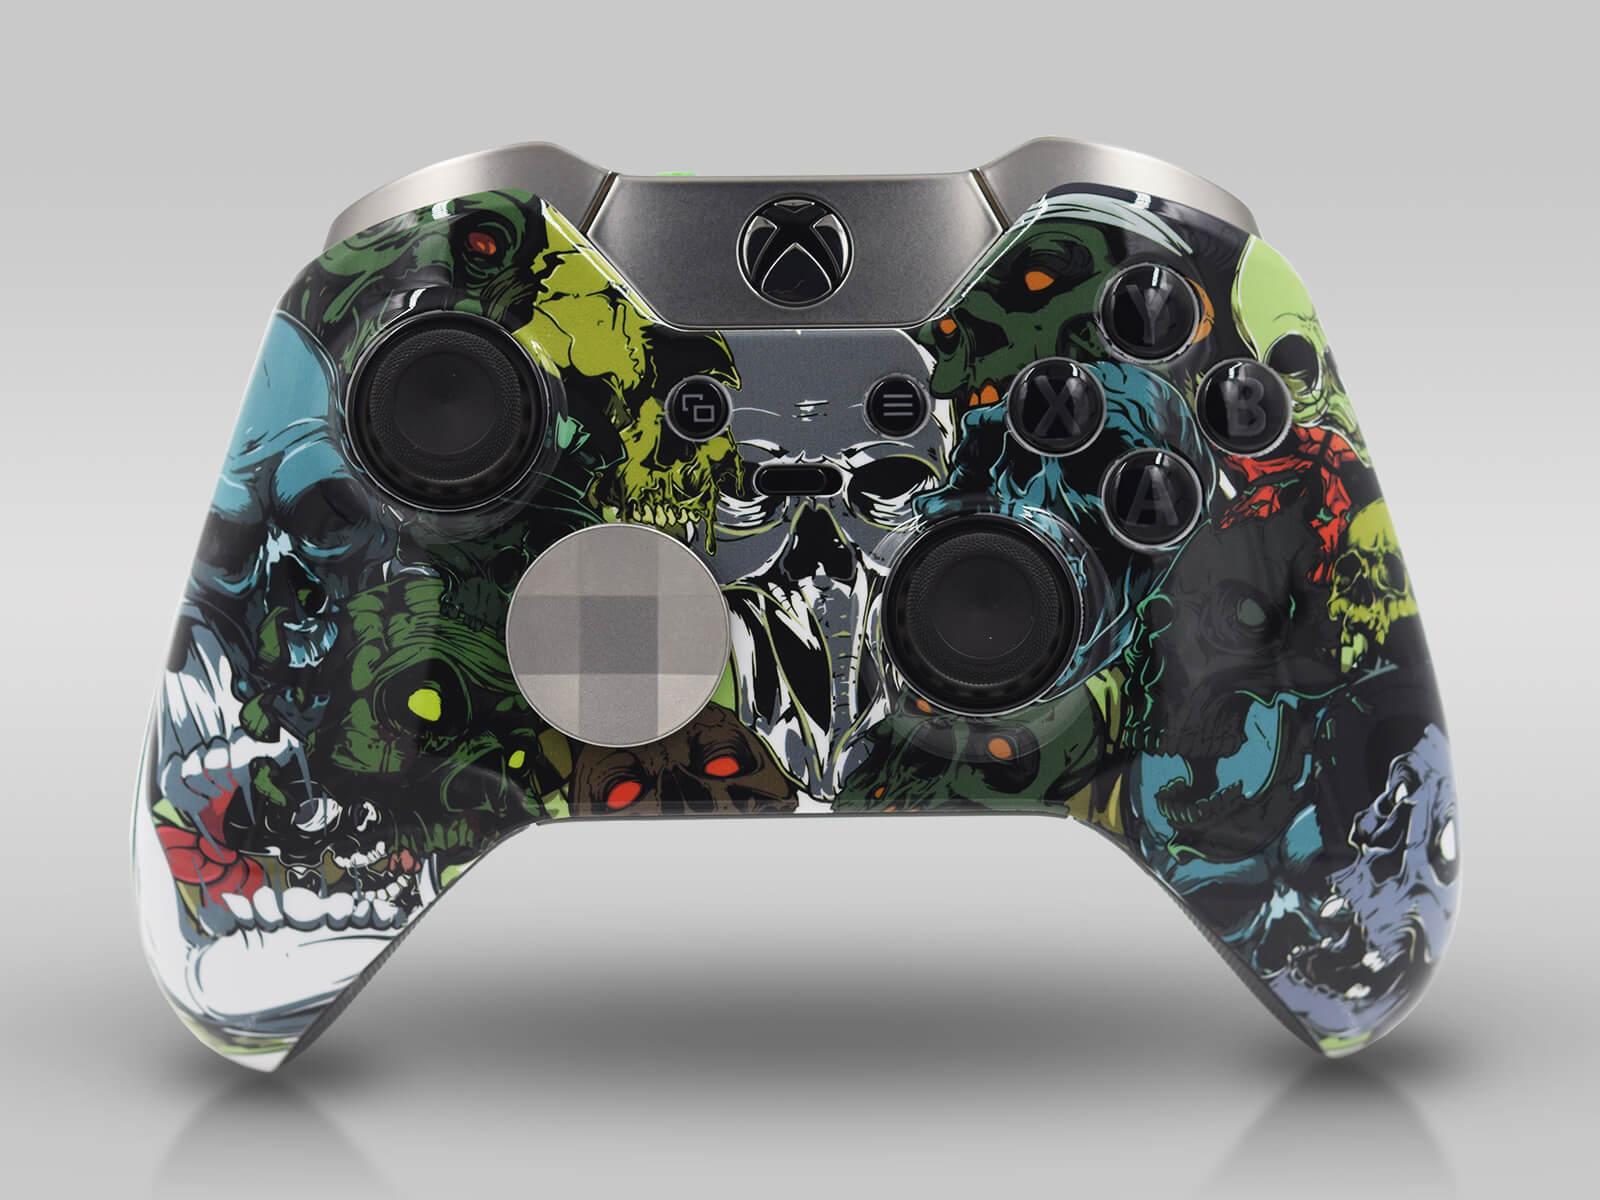 Xbox Elite Modded ControllerSkull Heads